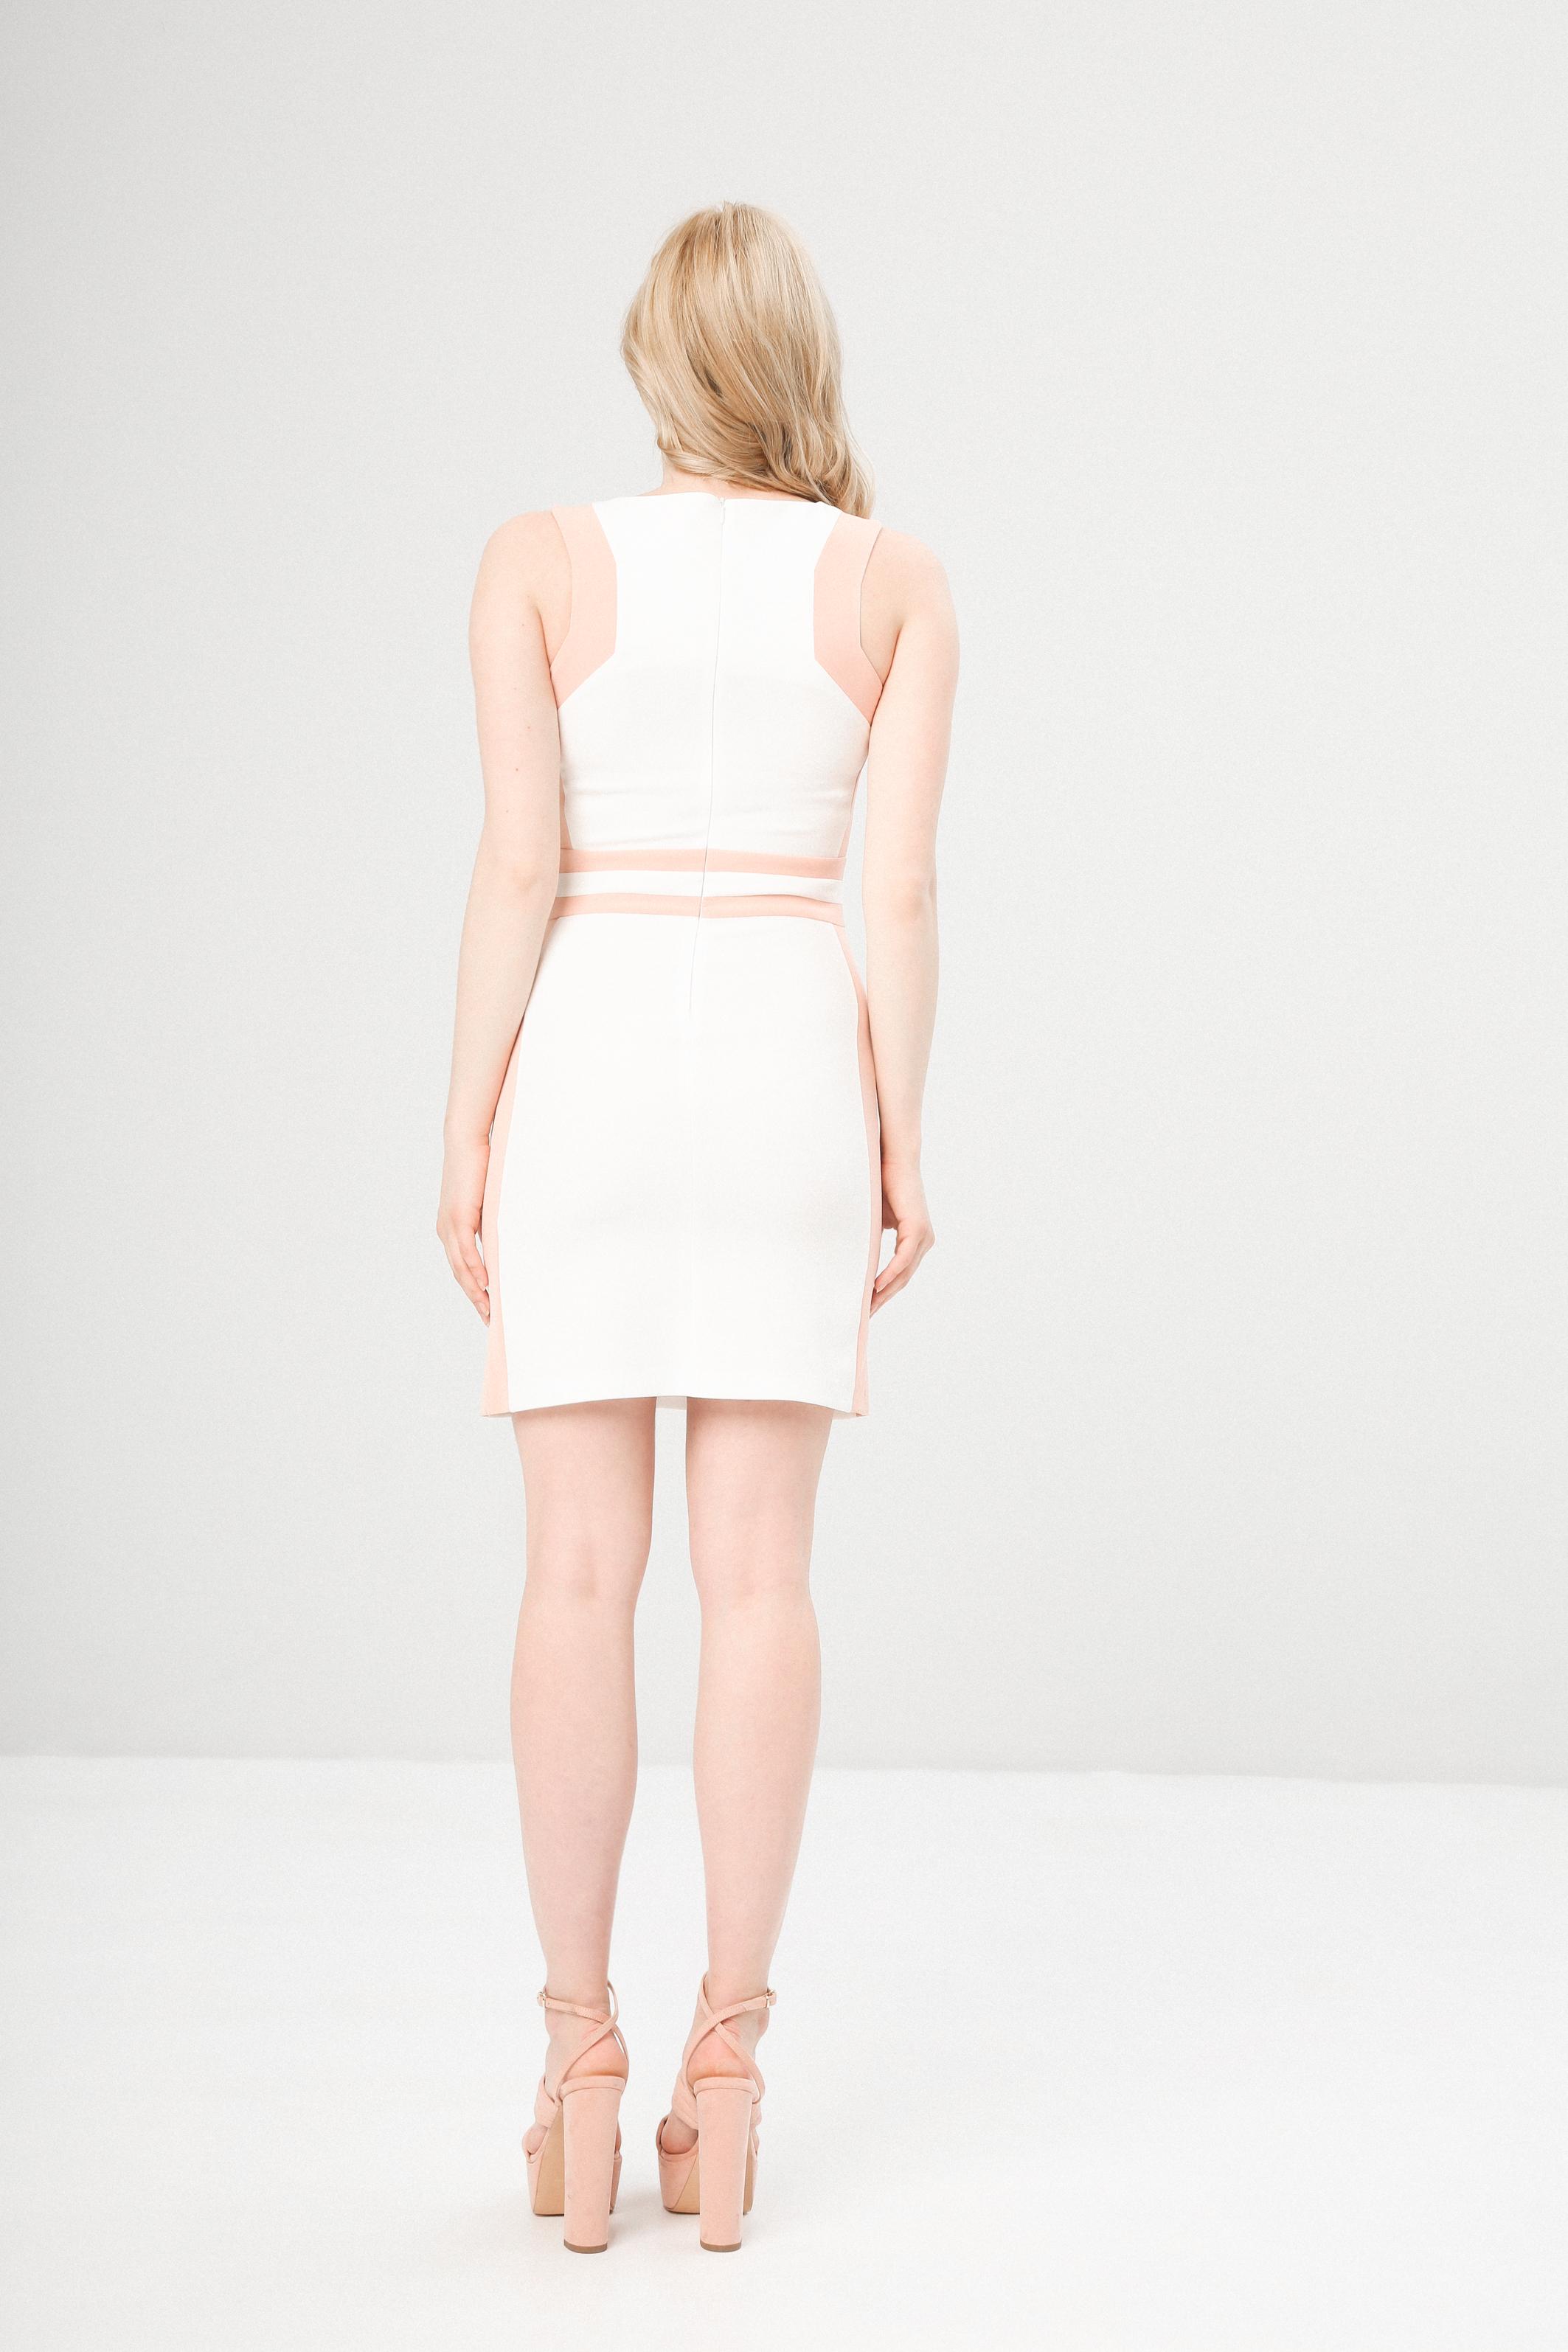 Robes  Fontana 2.0 BENVENUTA white